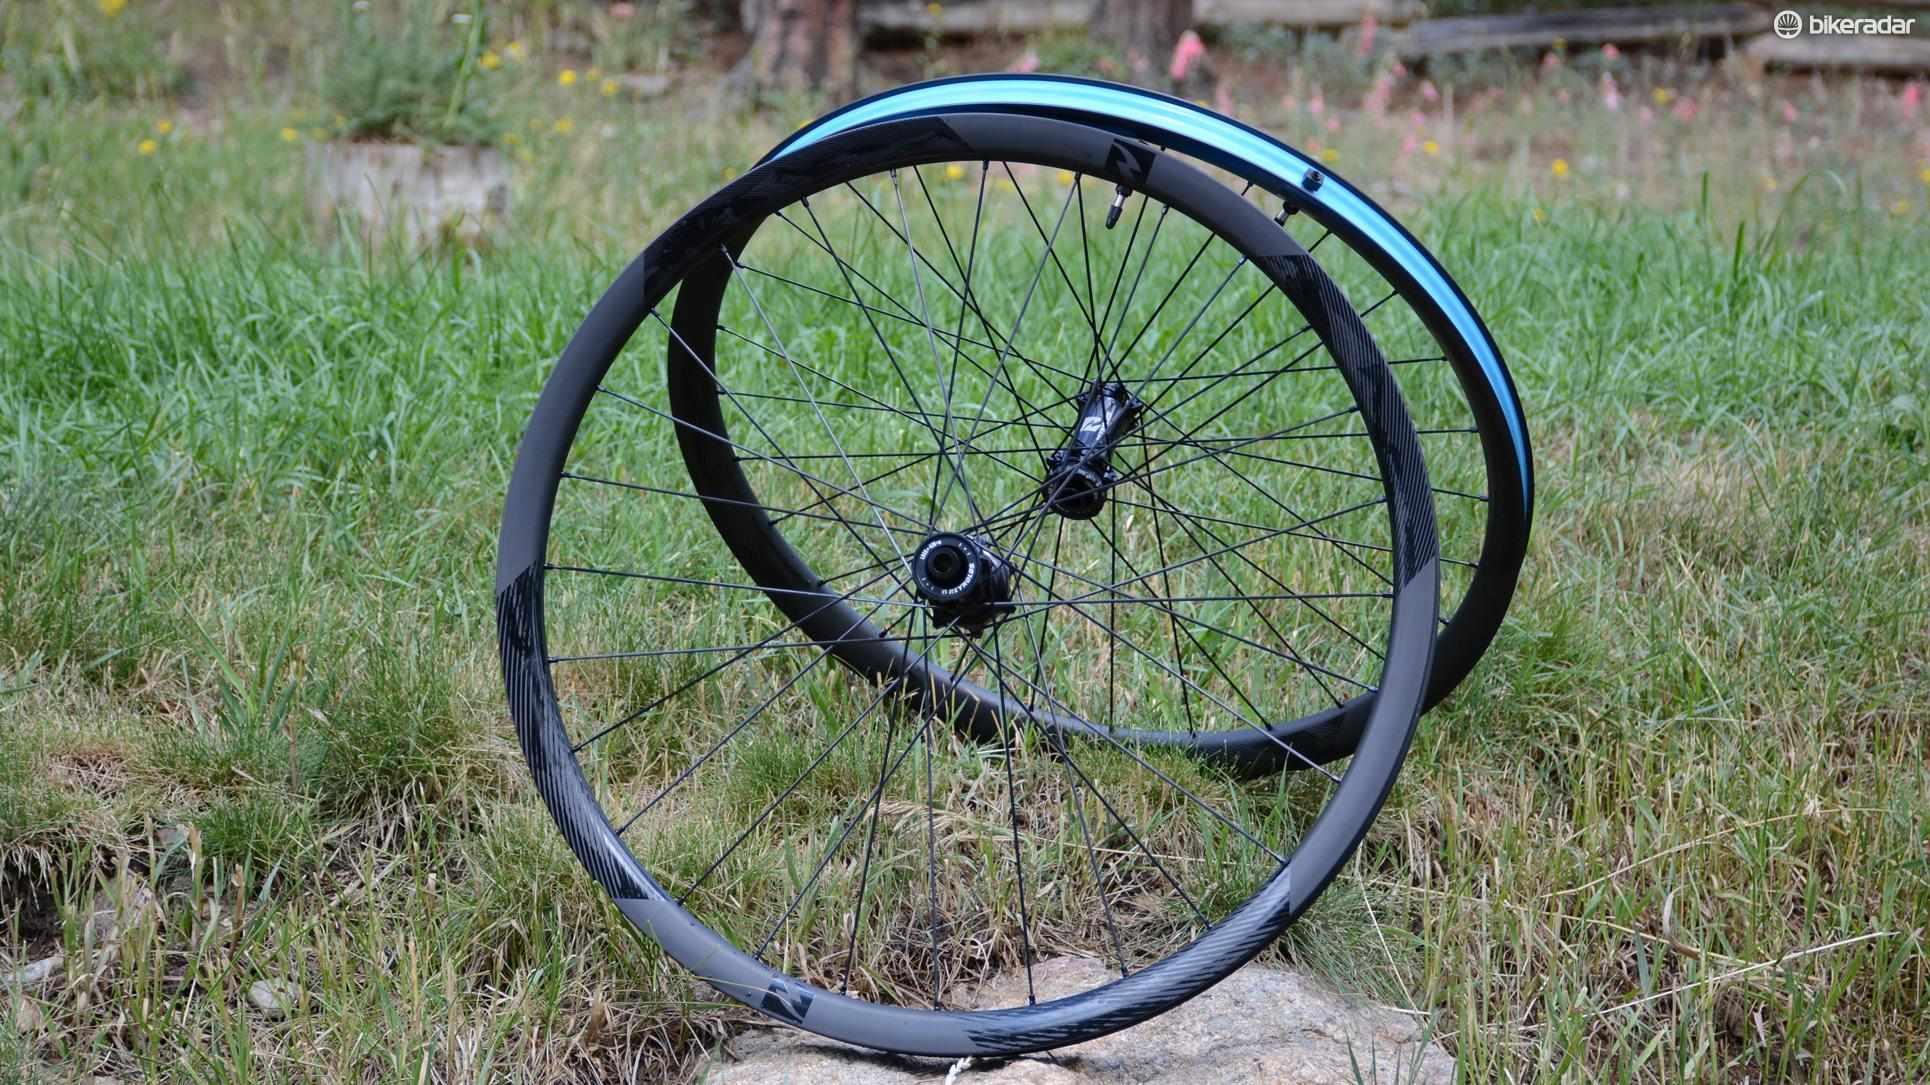 Reynolds' Blacklabel Enduro 27.5 wheels have 28mm wide rims and Industry Nine Torch hubs